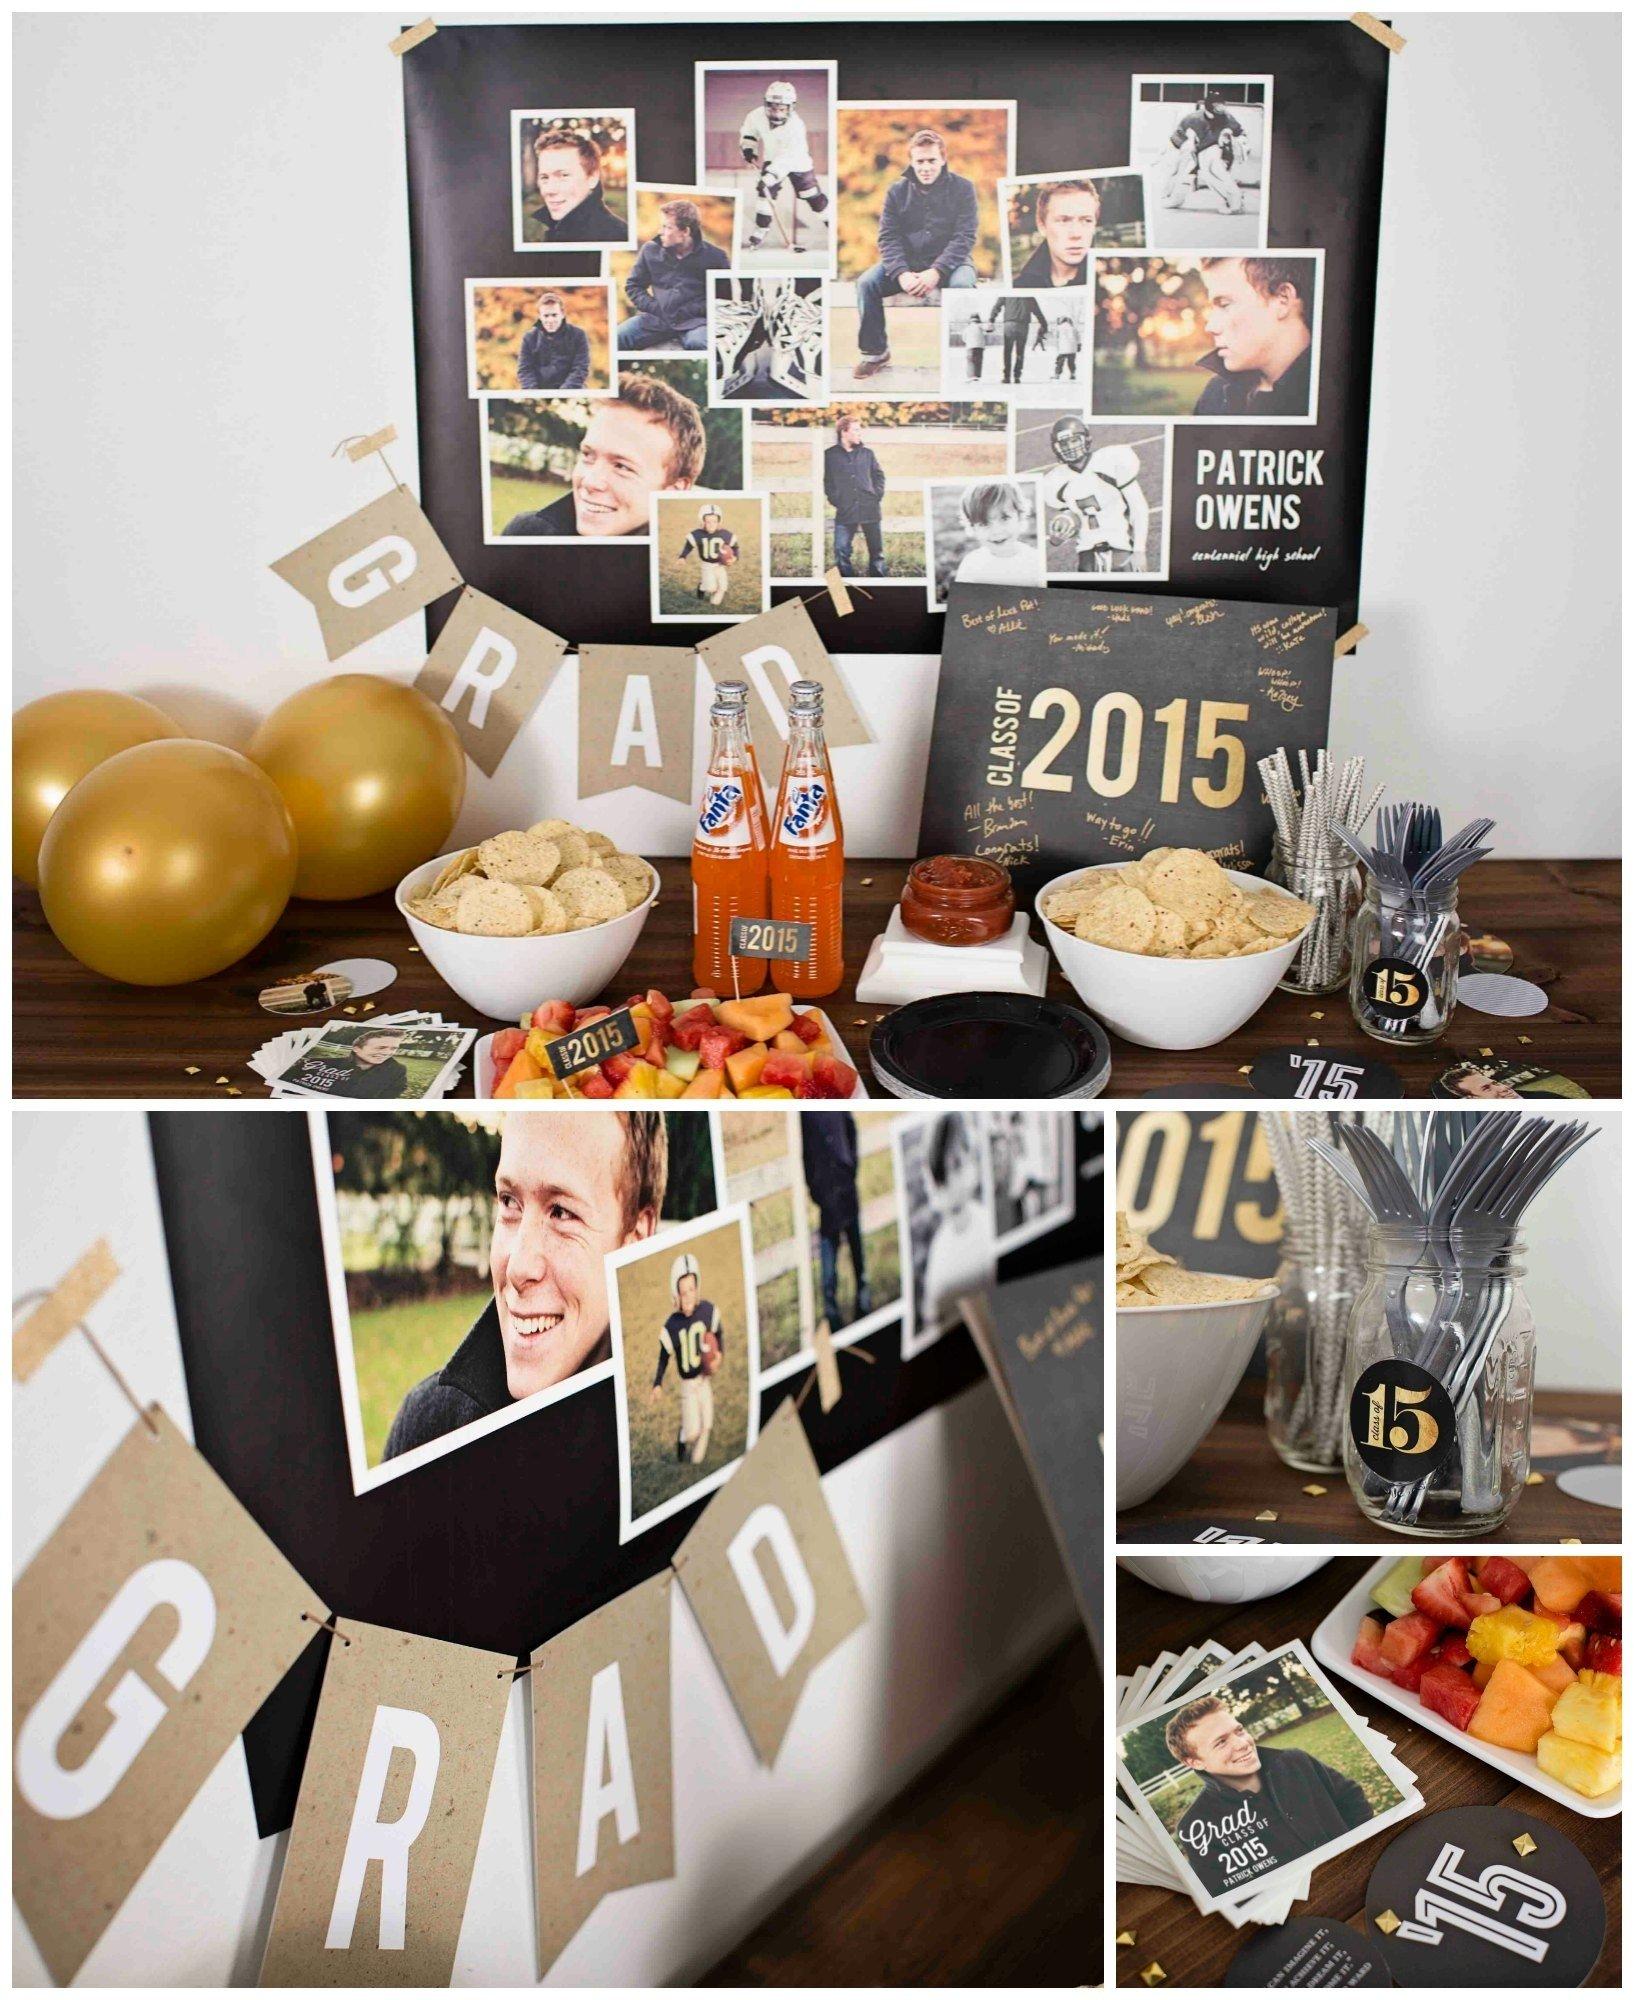 10 Best High School Graduation Party Ideas For Boys high school graduation party ideas for guys classic graduation party 1 2020